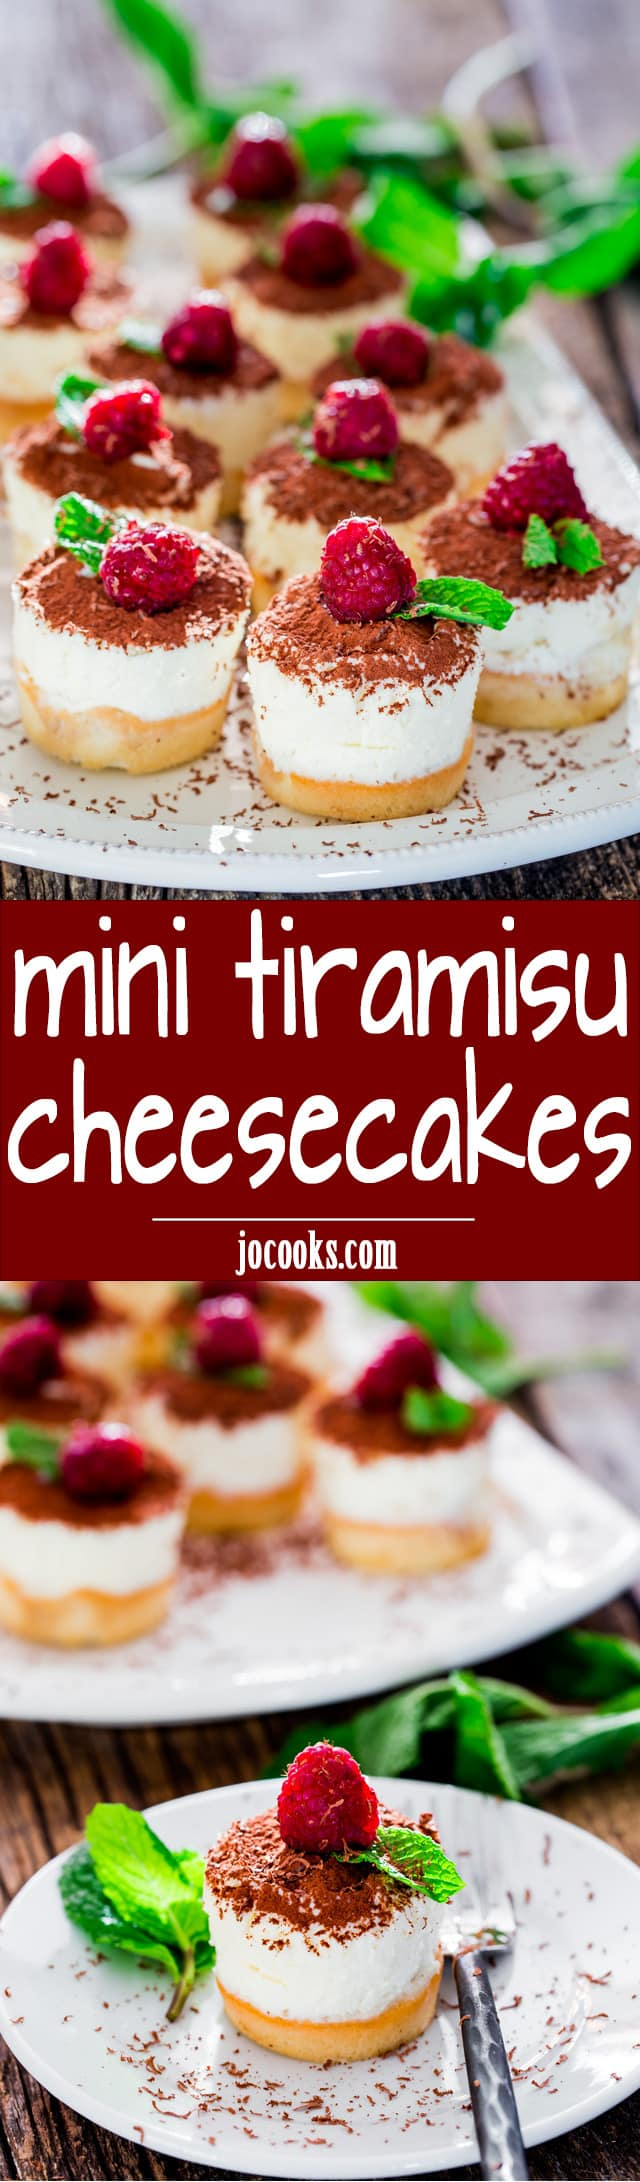 Mini Tiramisu Cheesecakes - mini decadent tiramisu cheesecakes with the classic flavors of the Italian tiramisu. Smooth and creamy, ideal for any occasion! www.jocooks.com #minicheesecake